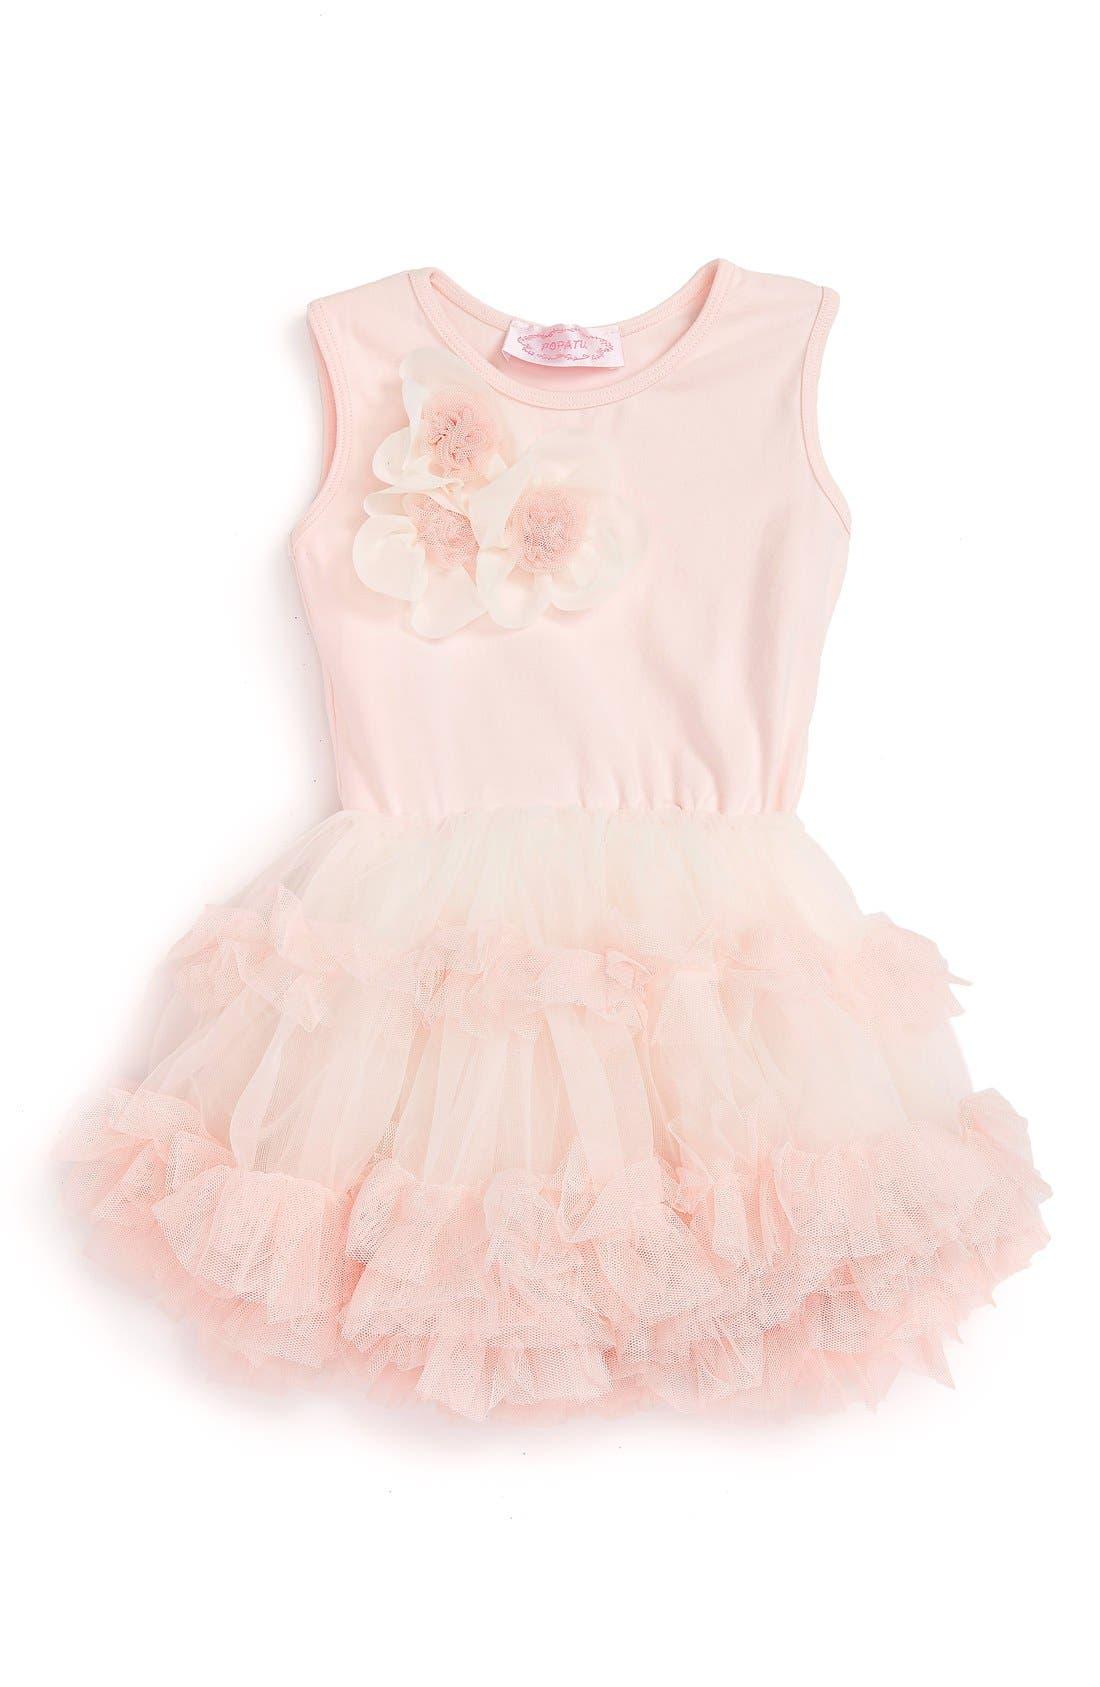 Alternate Image 1 Selected - Popatu Sleeveless Floral Tutu Dress (Baby Girls)